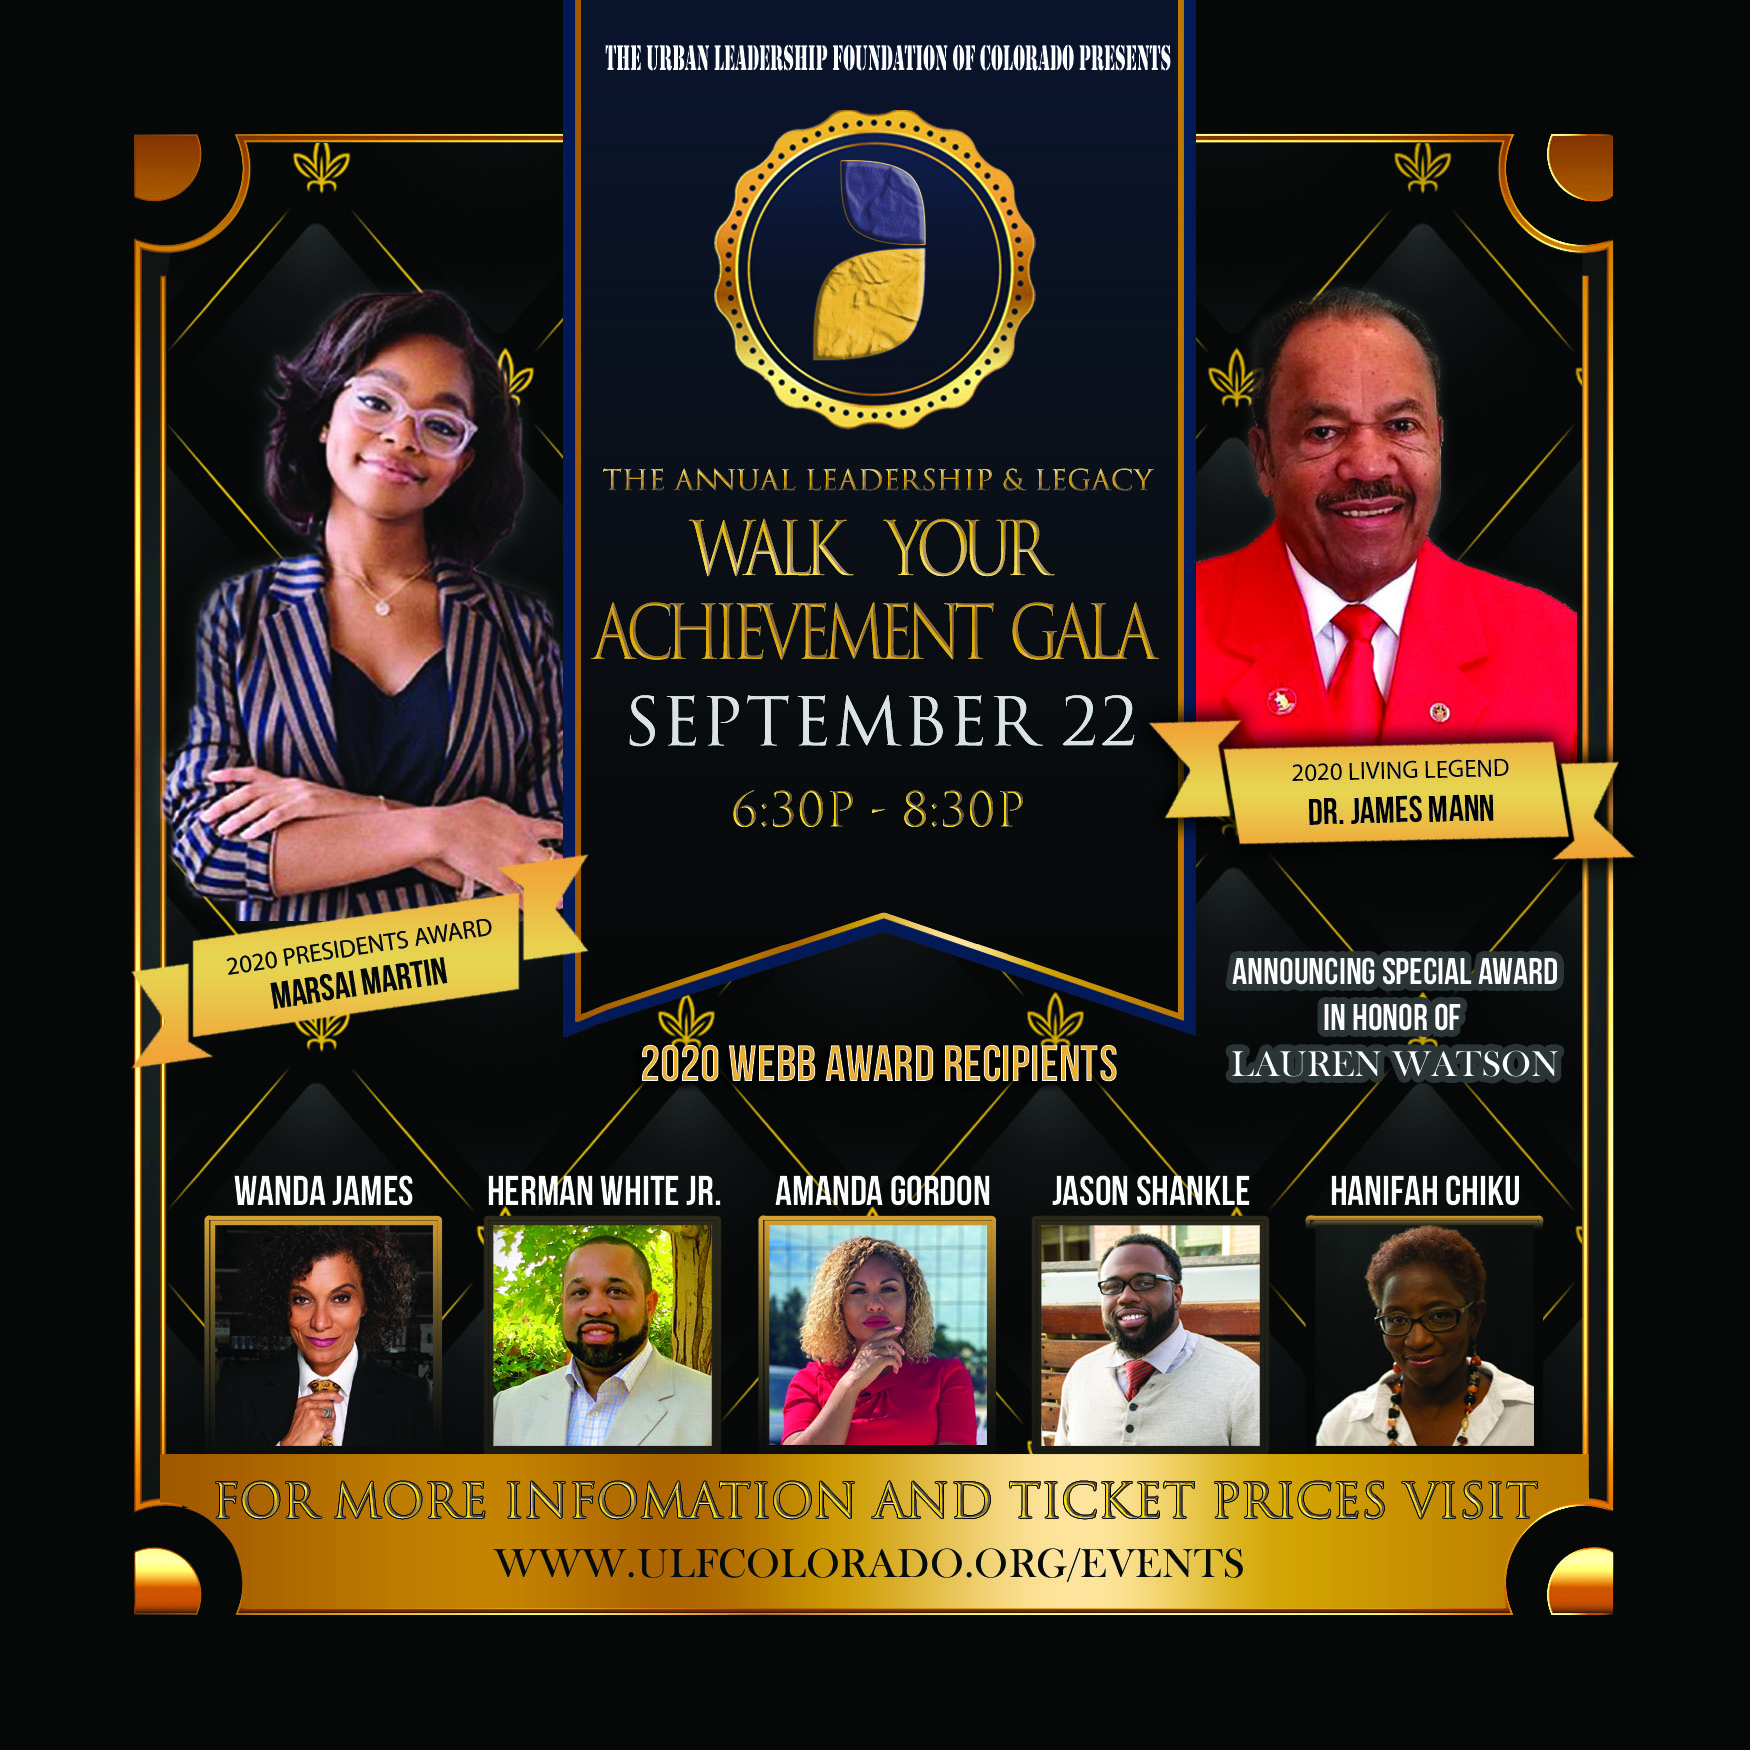 Walk Your Achievement Gala 2020